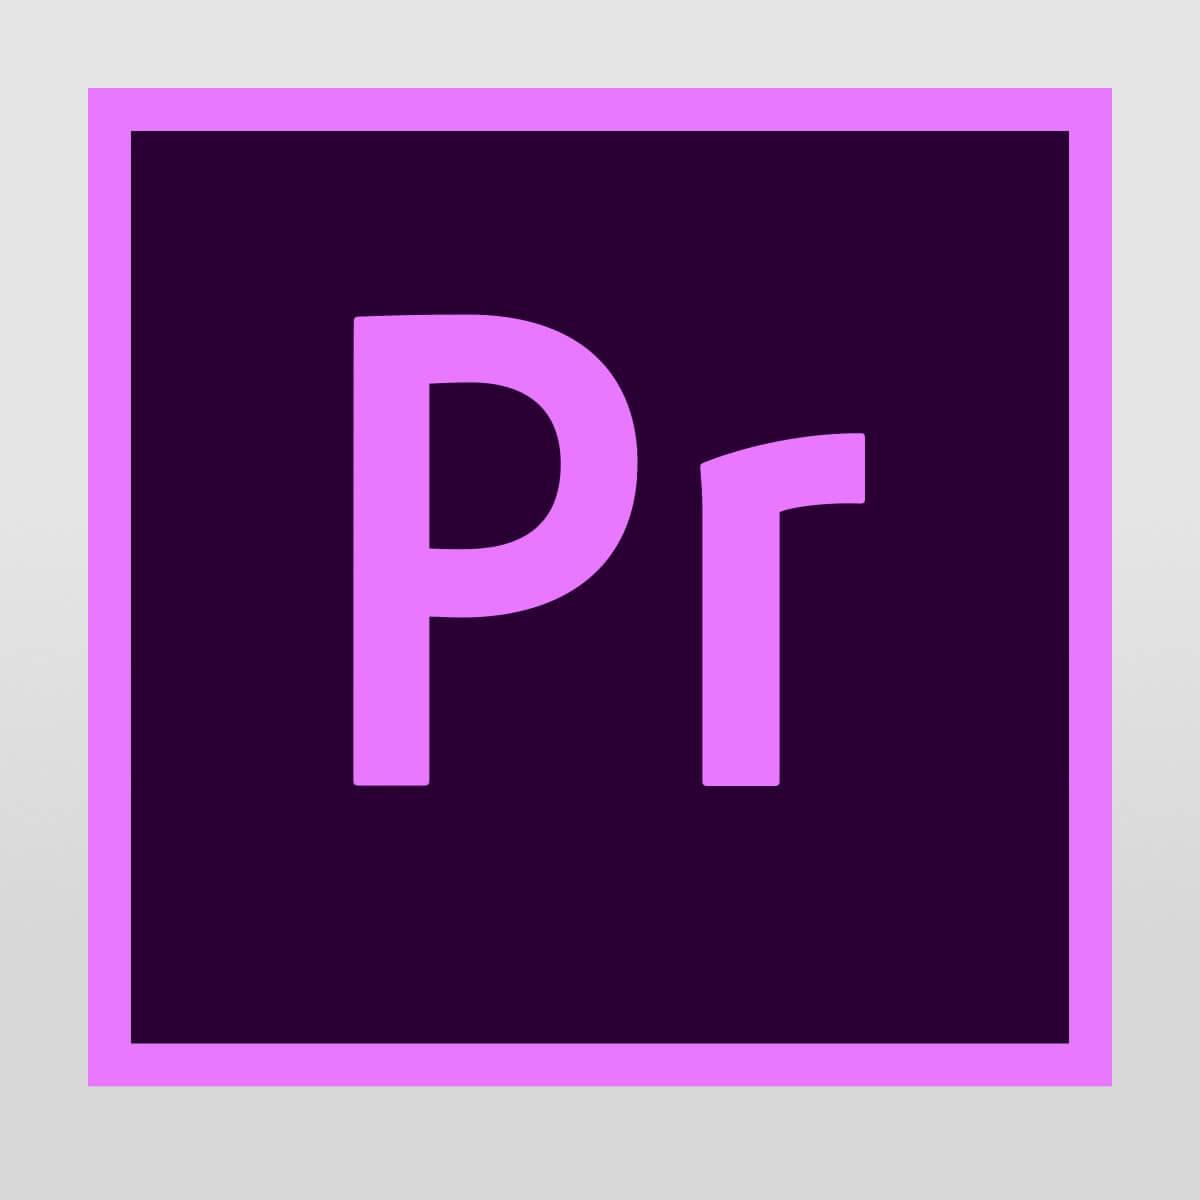 Adobe Premiere no exporta video